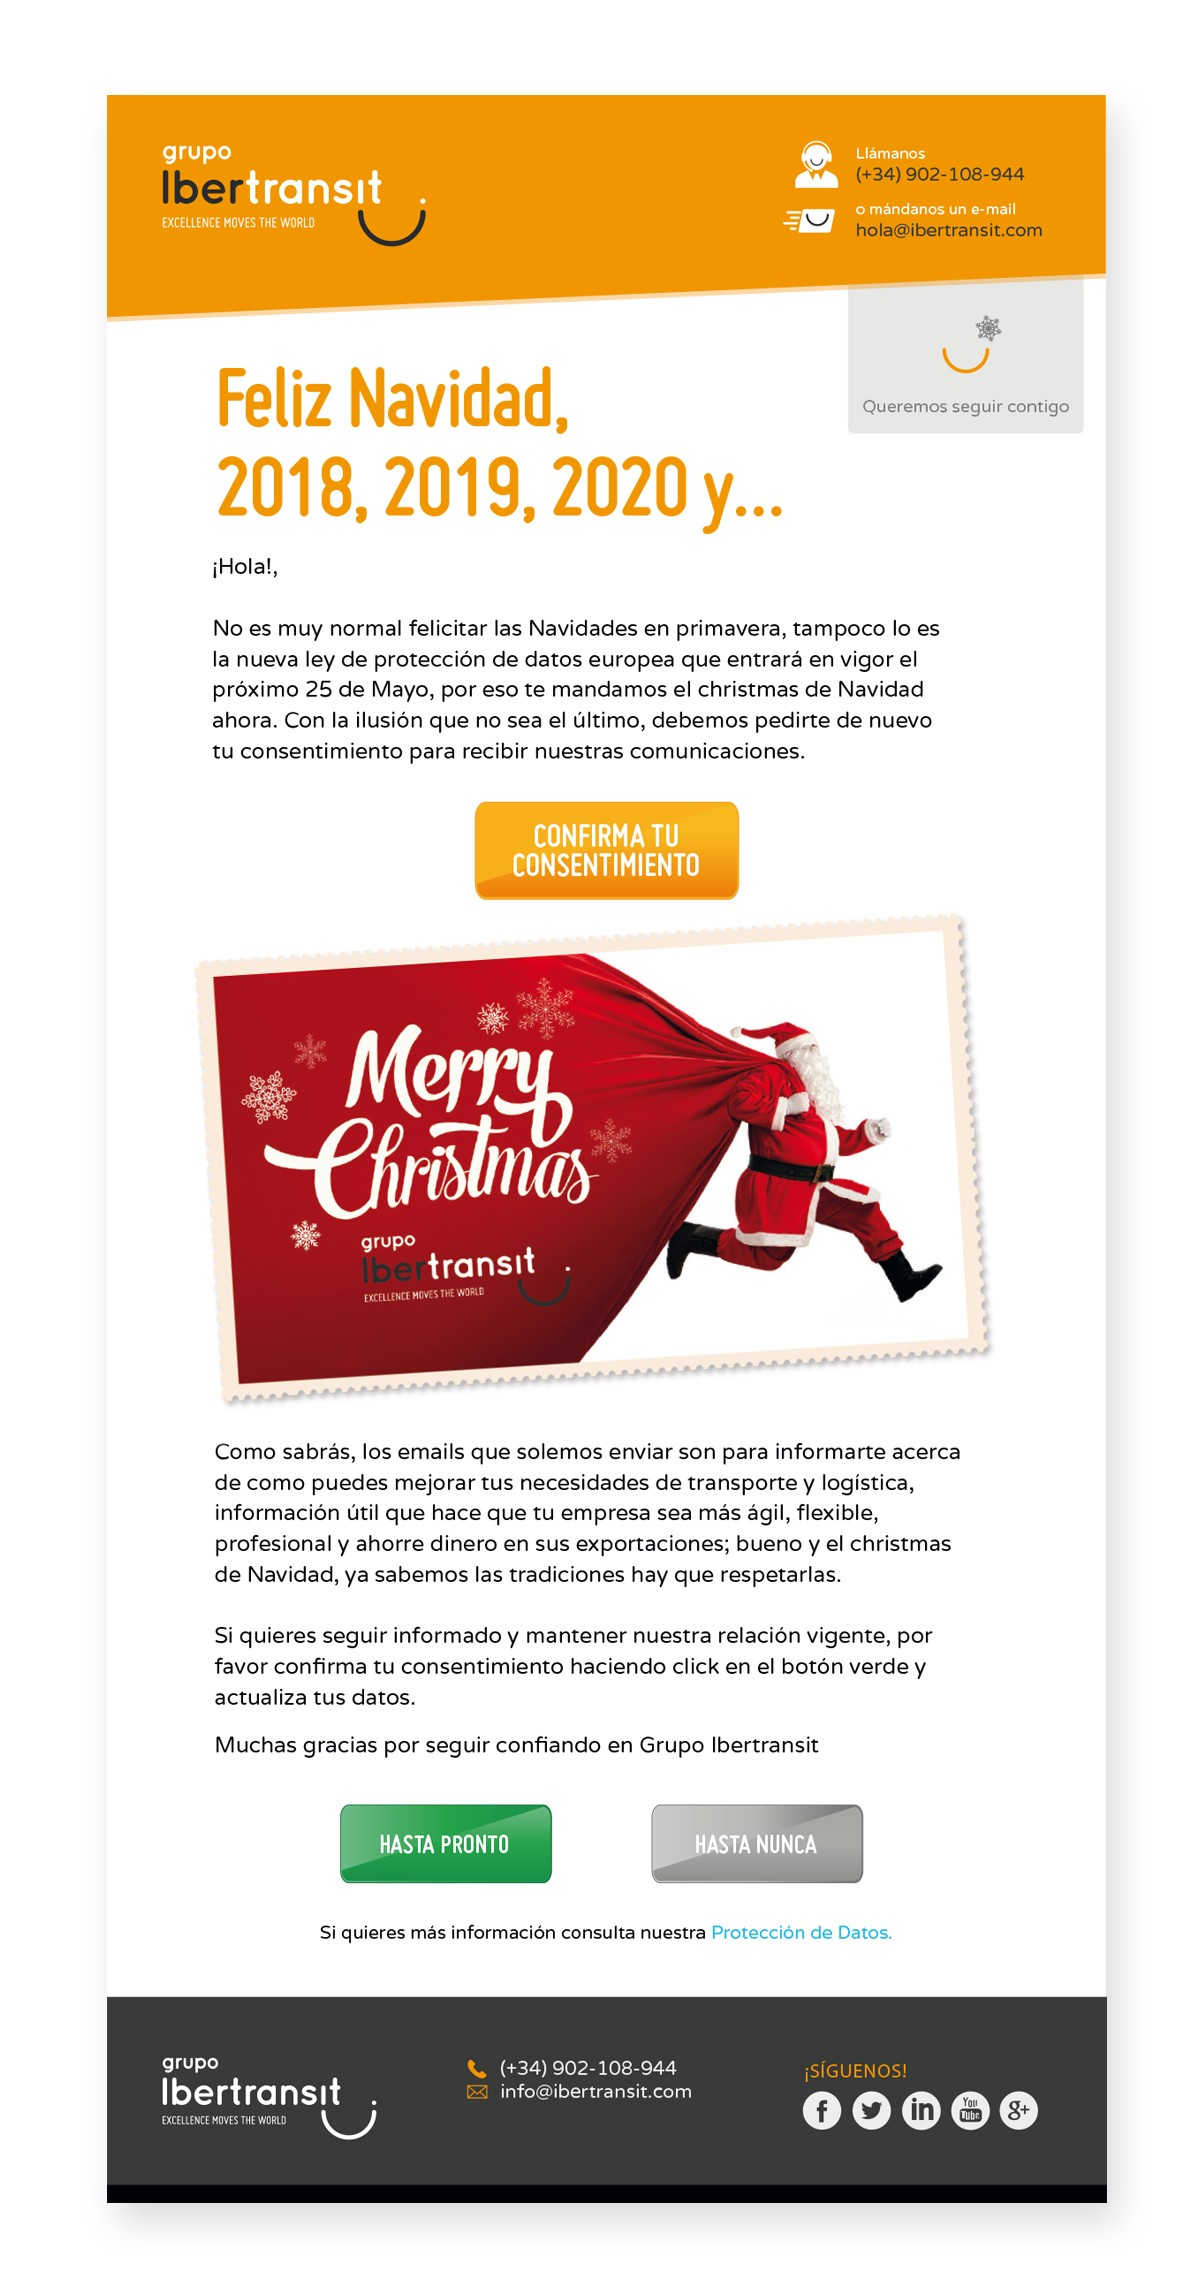 Calendarios De Bolsillo Personalizados Gratis Para Imprimir Actual Adn Studio Agencia Creativa De Unicaci³n Autor En Adn Studio